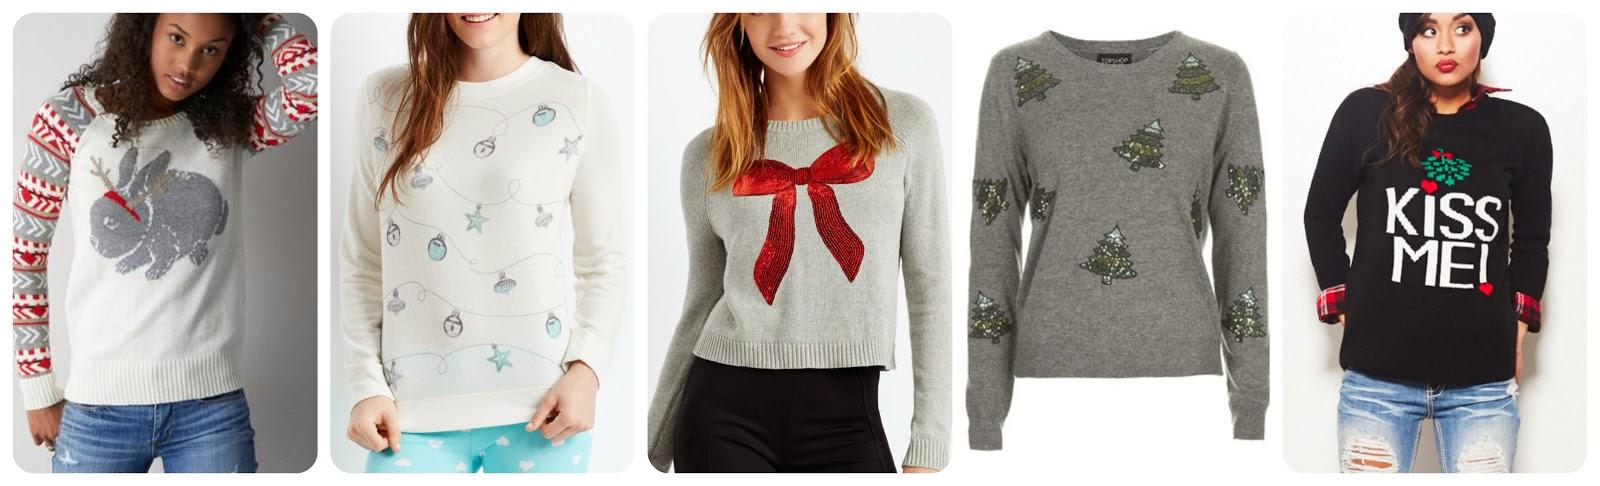 Blogmas #15 - The Ugly Christmas Sweater | Boston Beauty Buzz